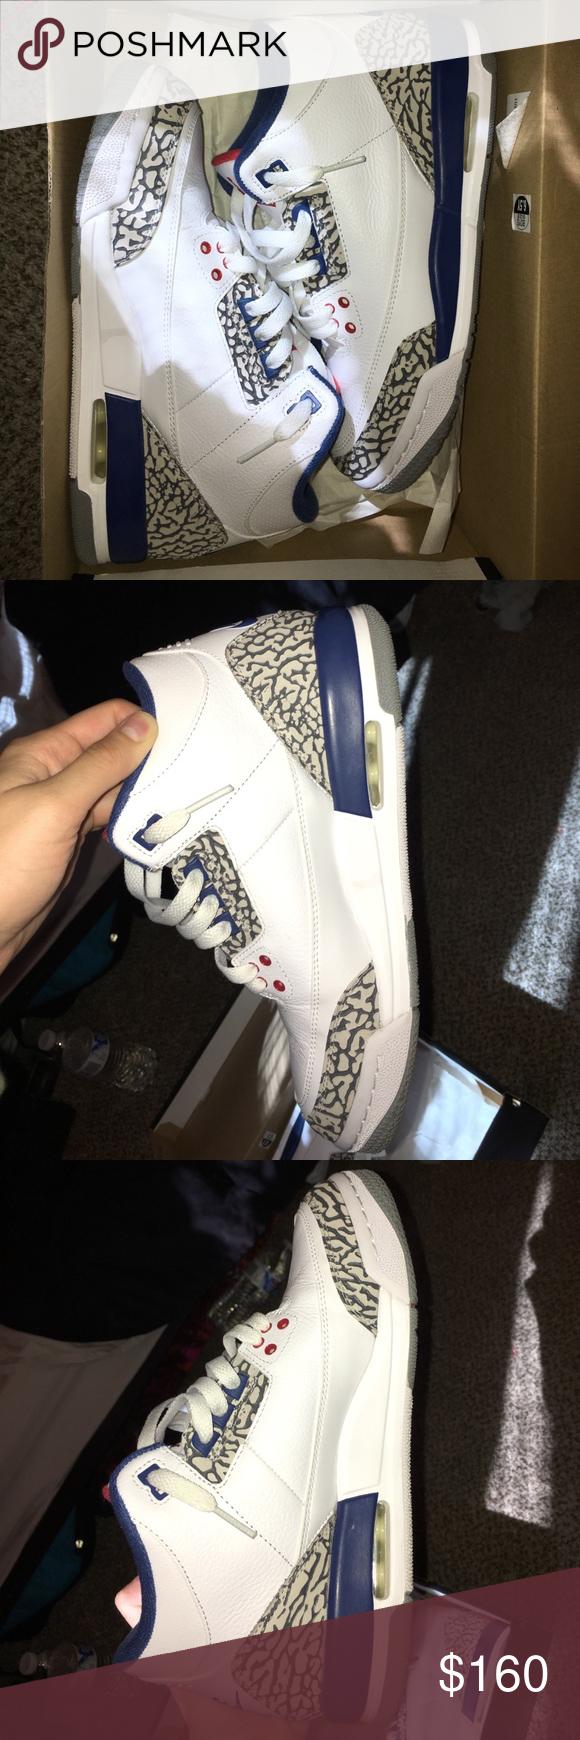 4f61edd1c8d6b8 Air Jordan 3 Retro OG BG